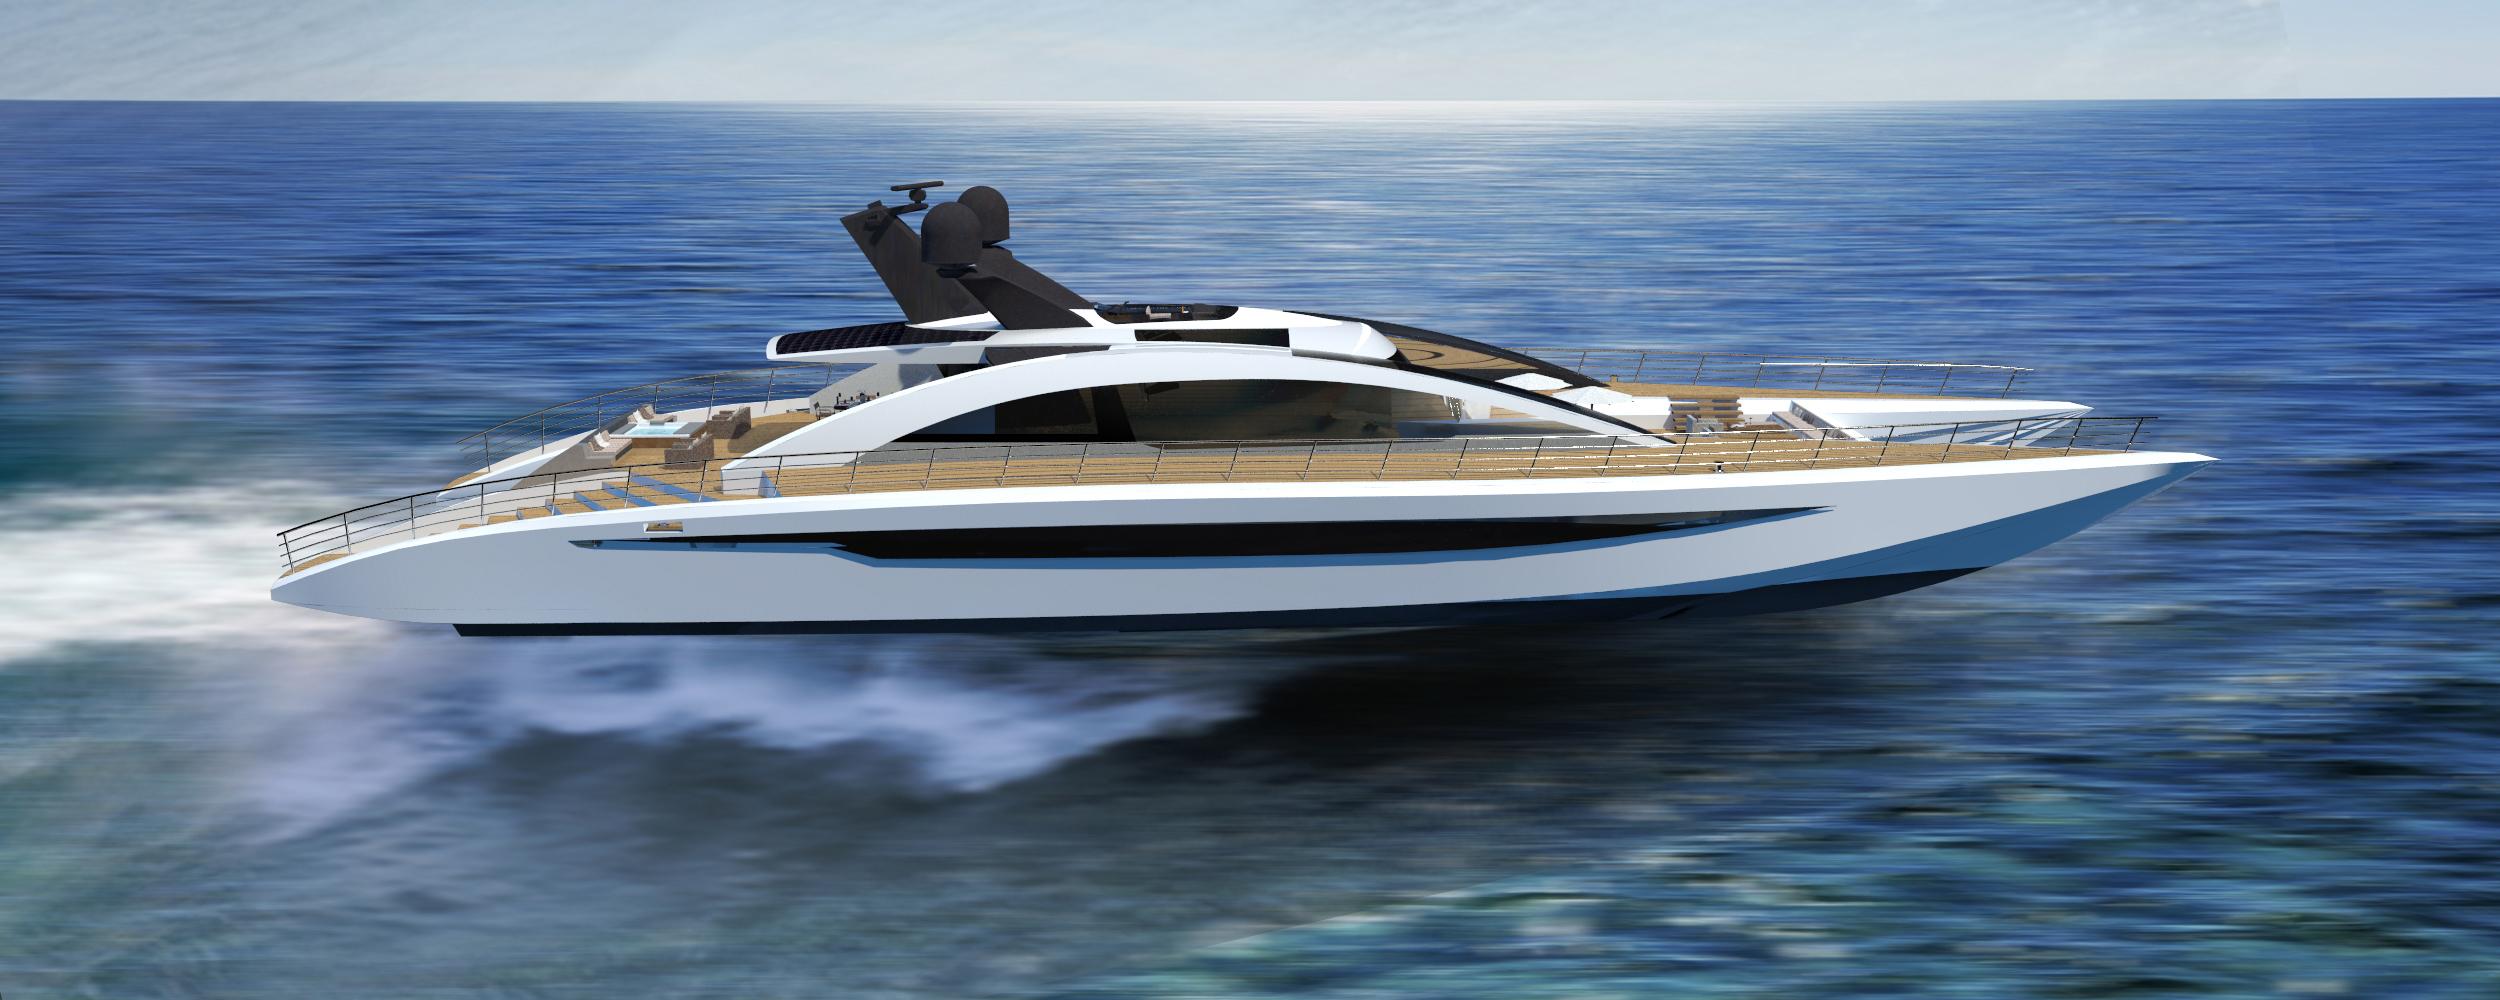 Andrew trujillo design yacht aircraft home design for Yacht dekoration